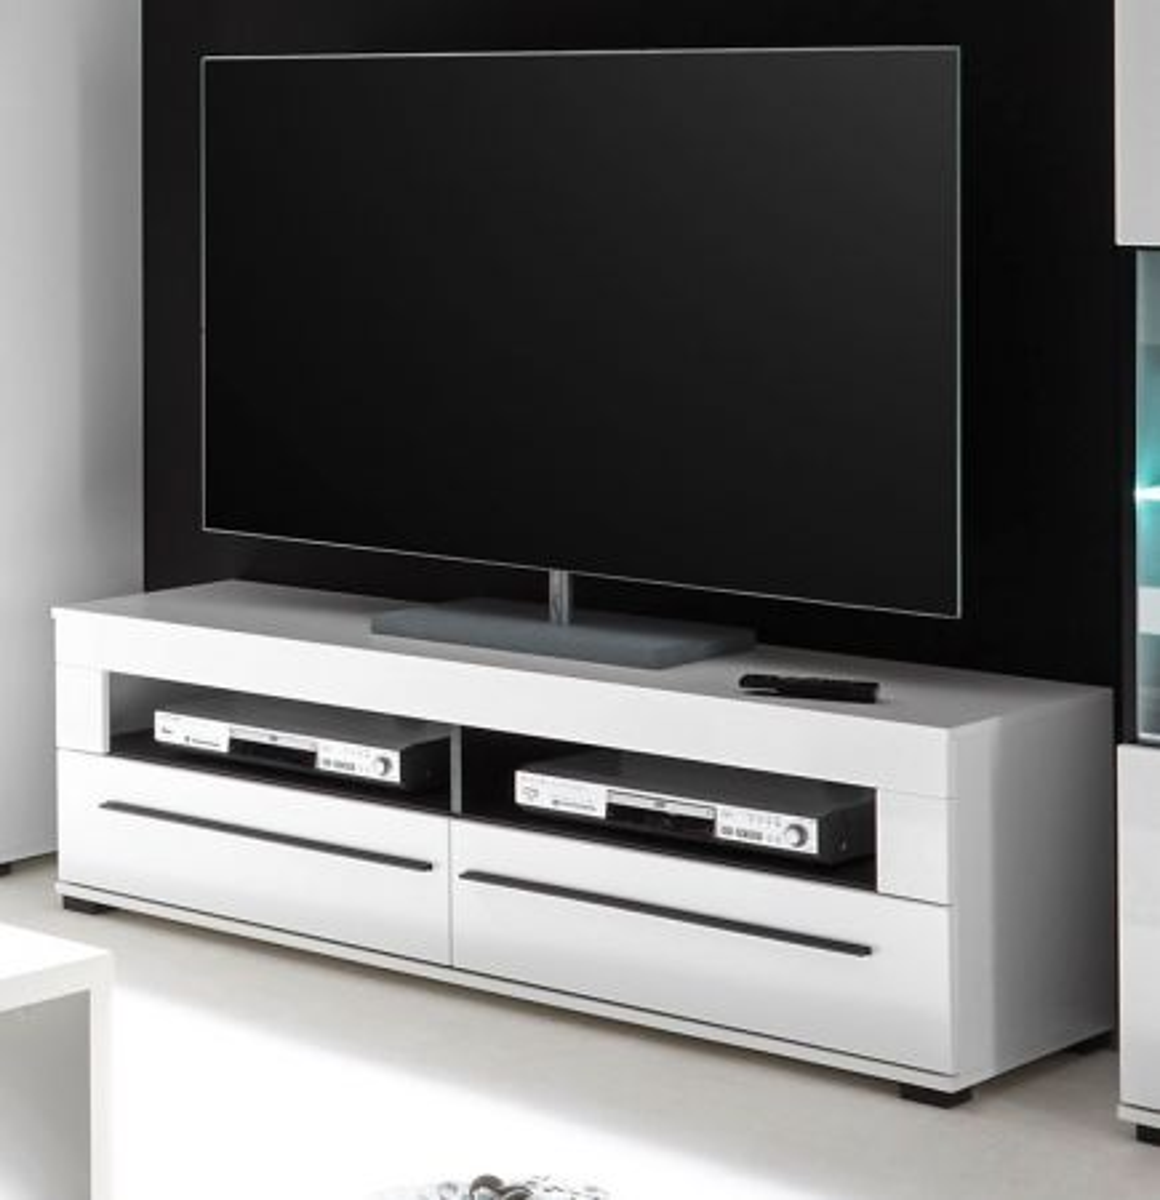 TV-Lowboard Design-D in Hochglanz weiss 140 x 47 cm